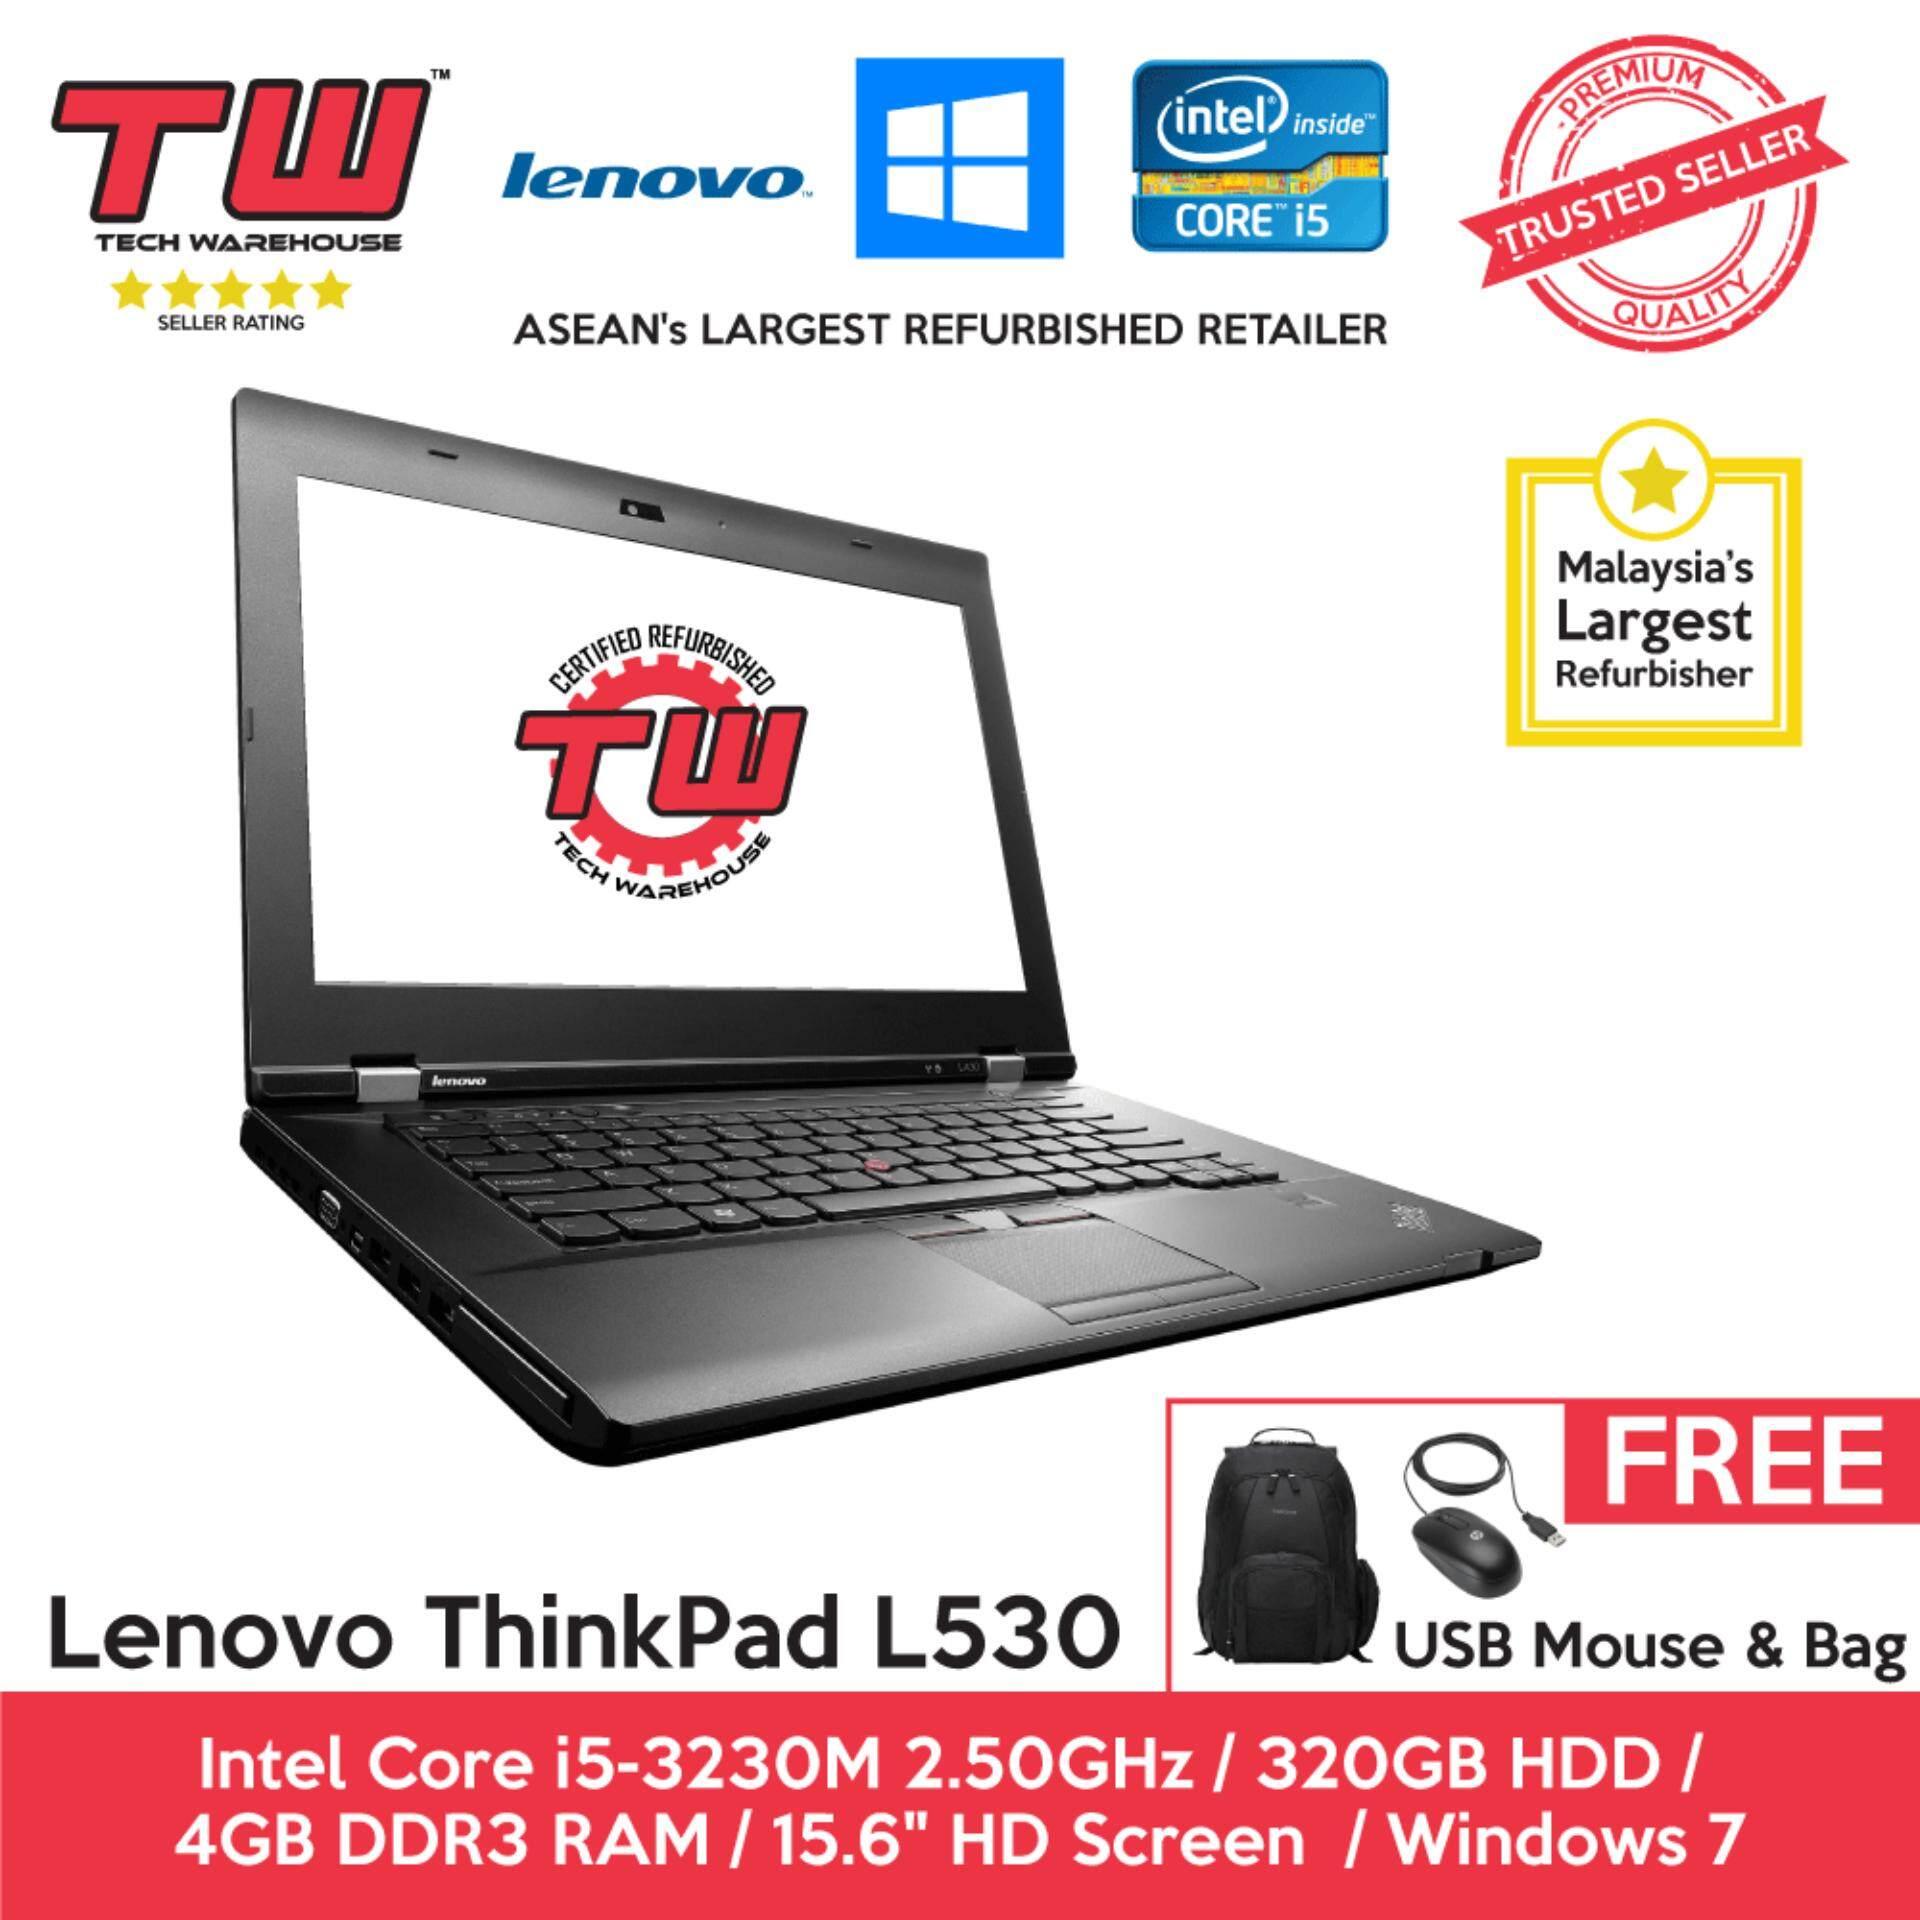 Lenovo ThinkPad L530 Core i5 3rd Generation / 4GB RAM / 320GB HDD / Windows 7 Laptop / 3 Months Warranty (Factory Refurbished) Malaysia